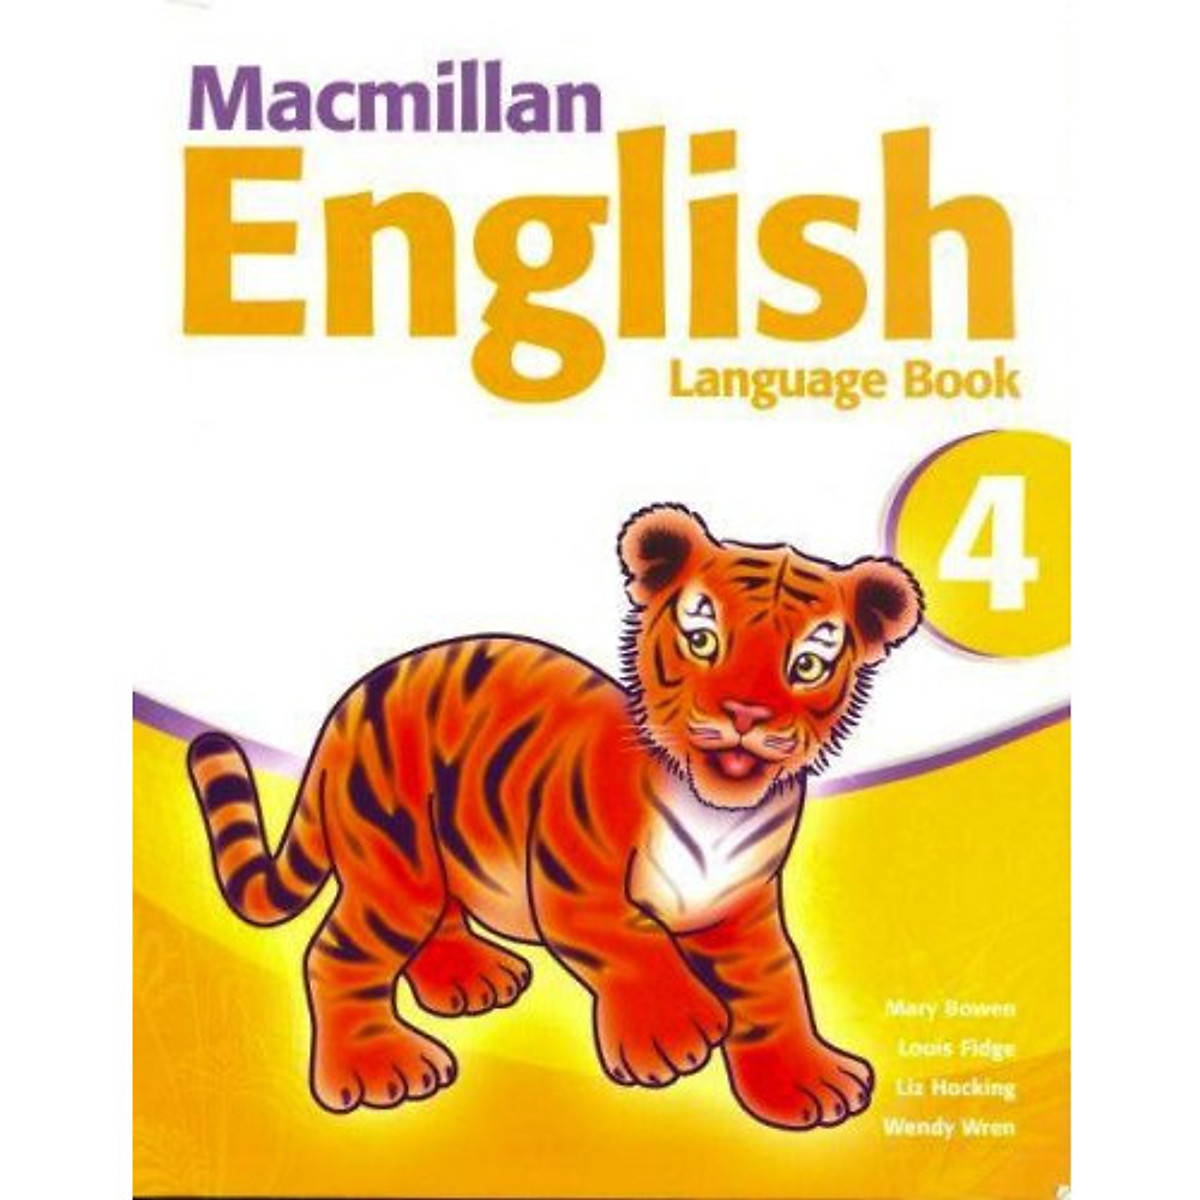 Hình đại diện sản phẩm Macmillan English 4: Language Book (Primary ELT Course for the Middle East): Language Book (Primary ELT Course for the Middle East)